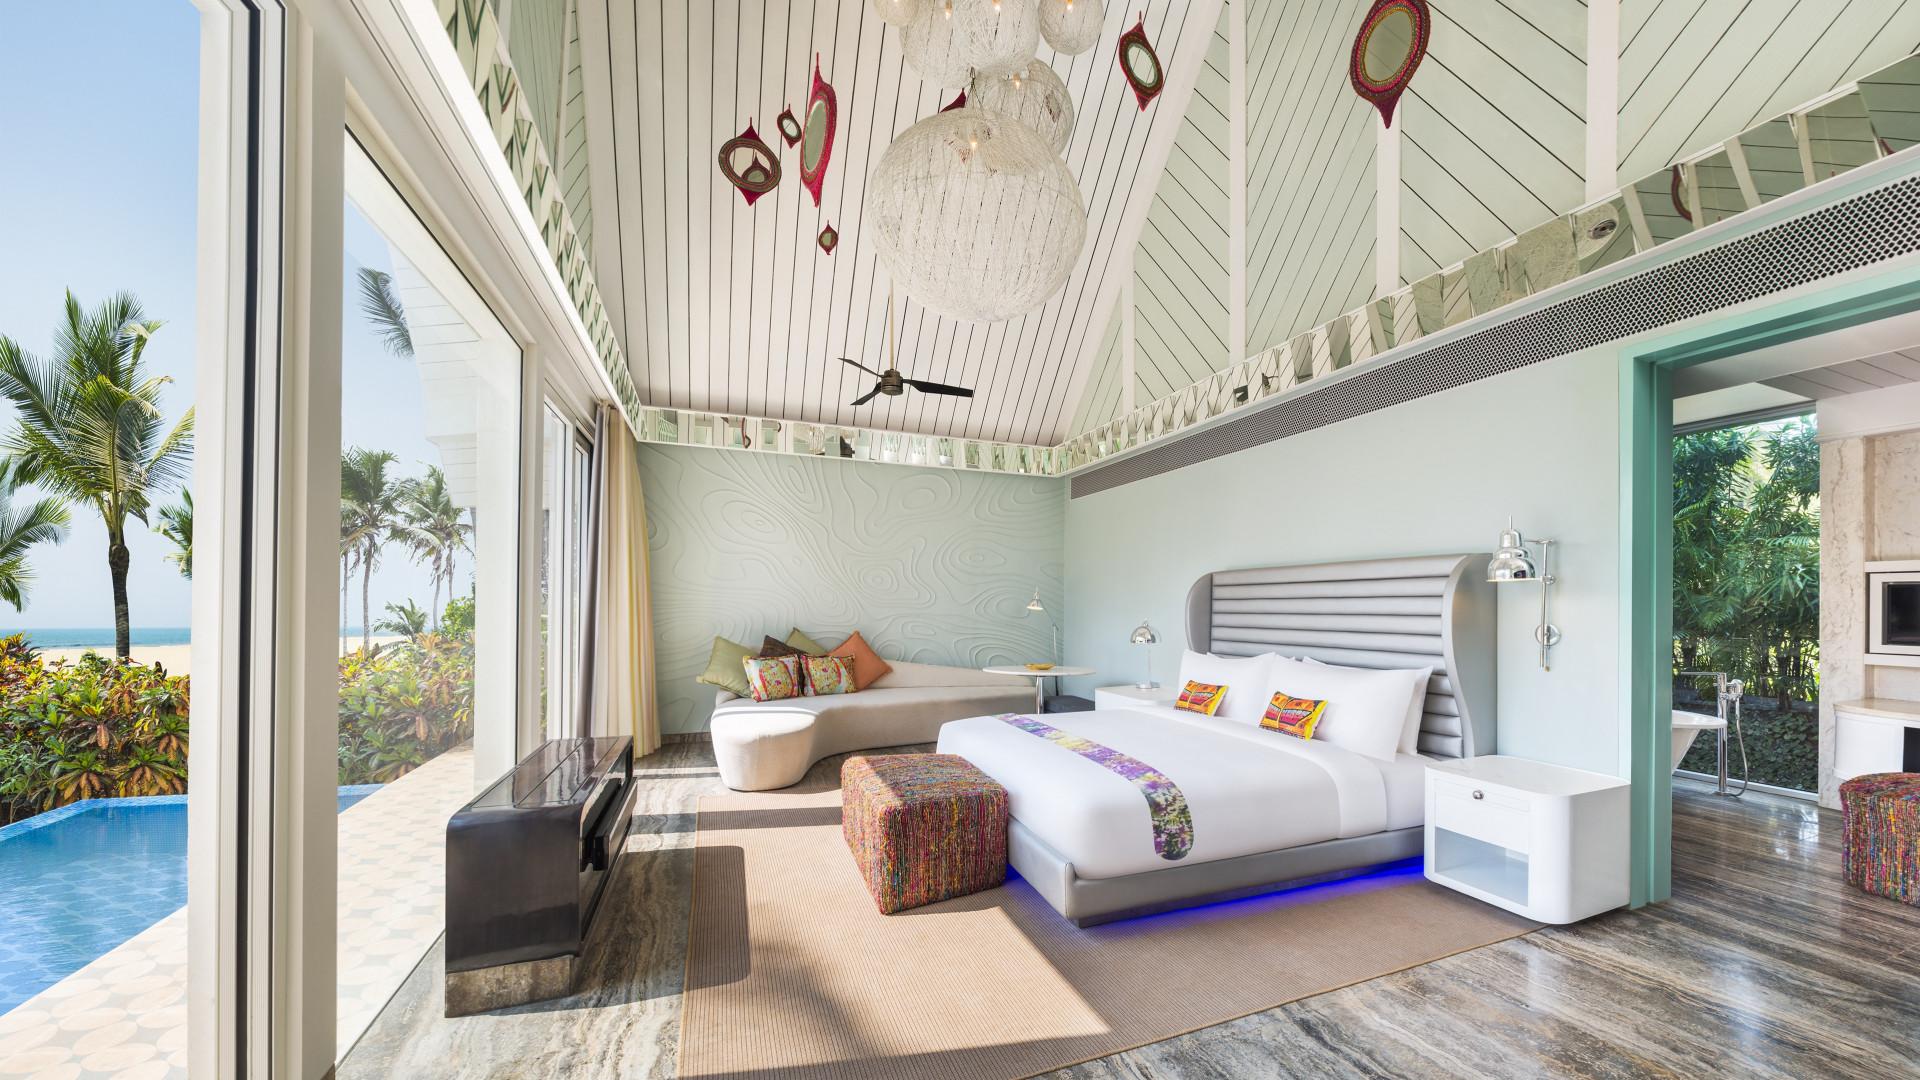 W hotel Goa room interior